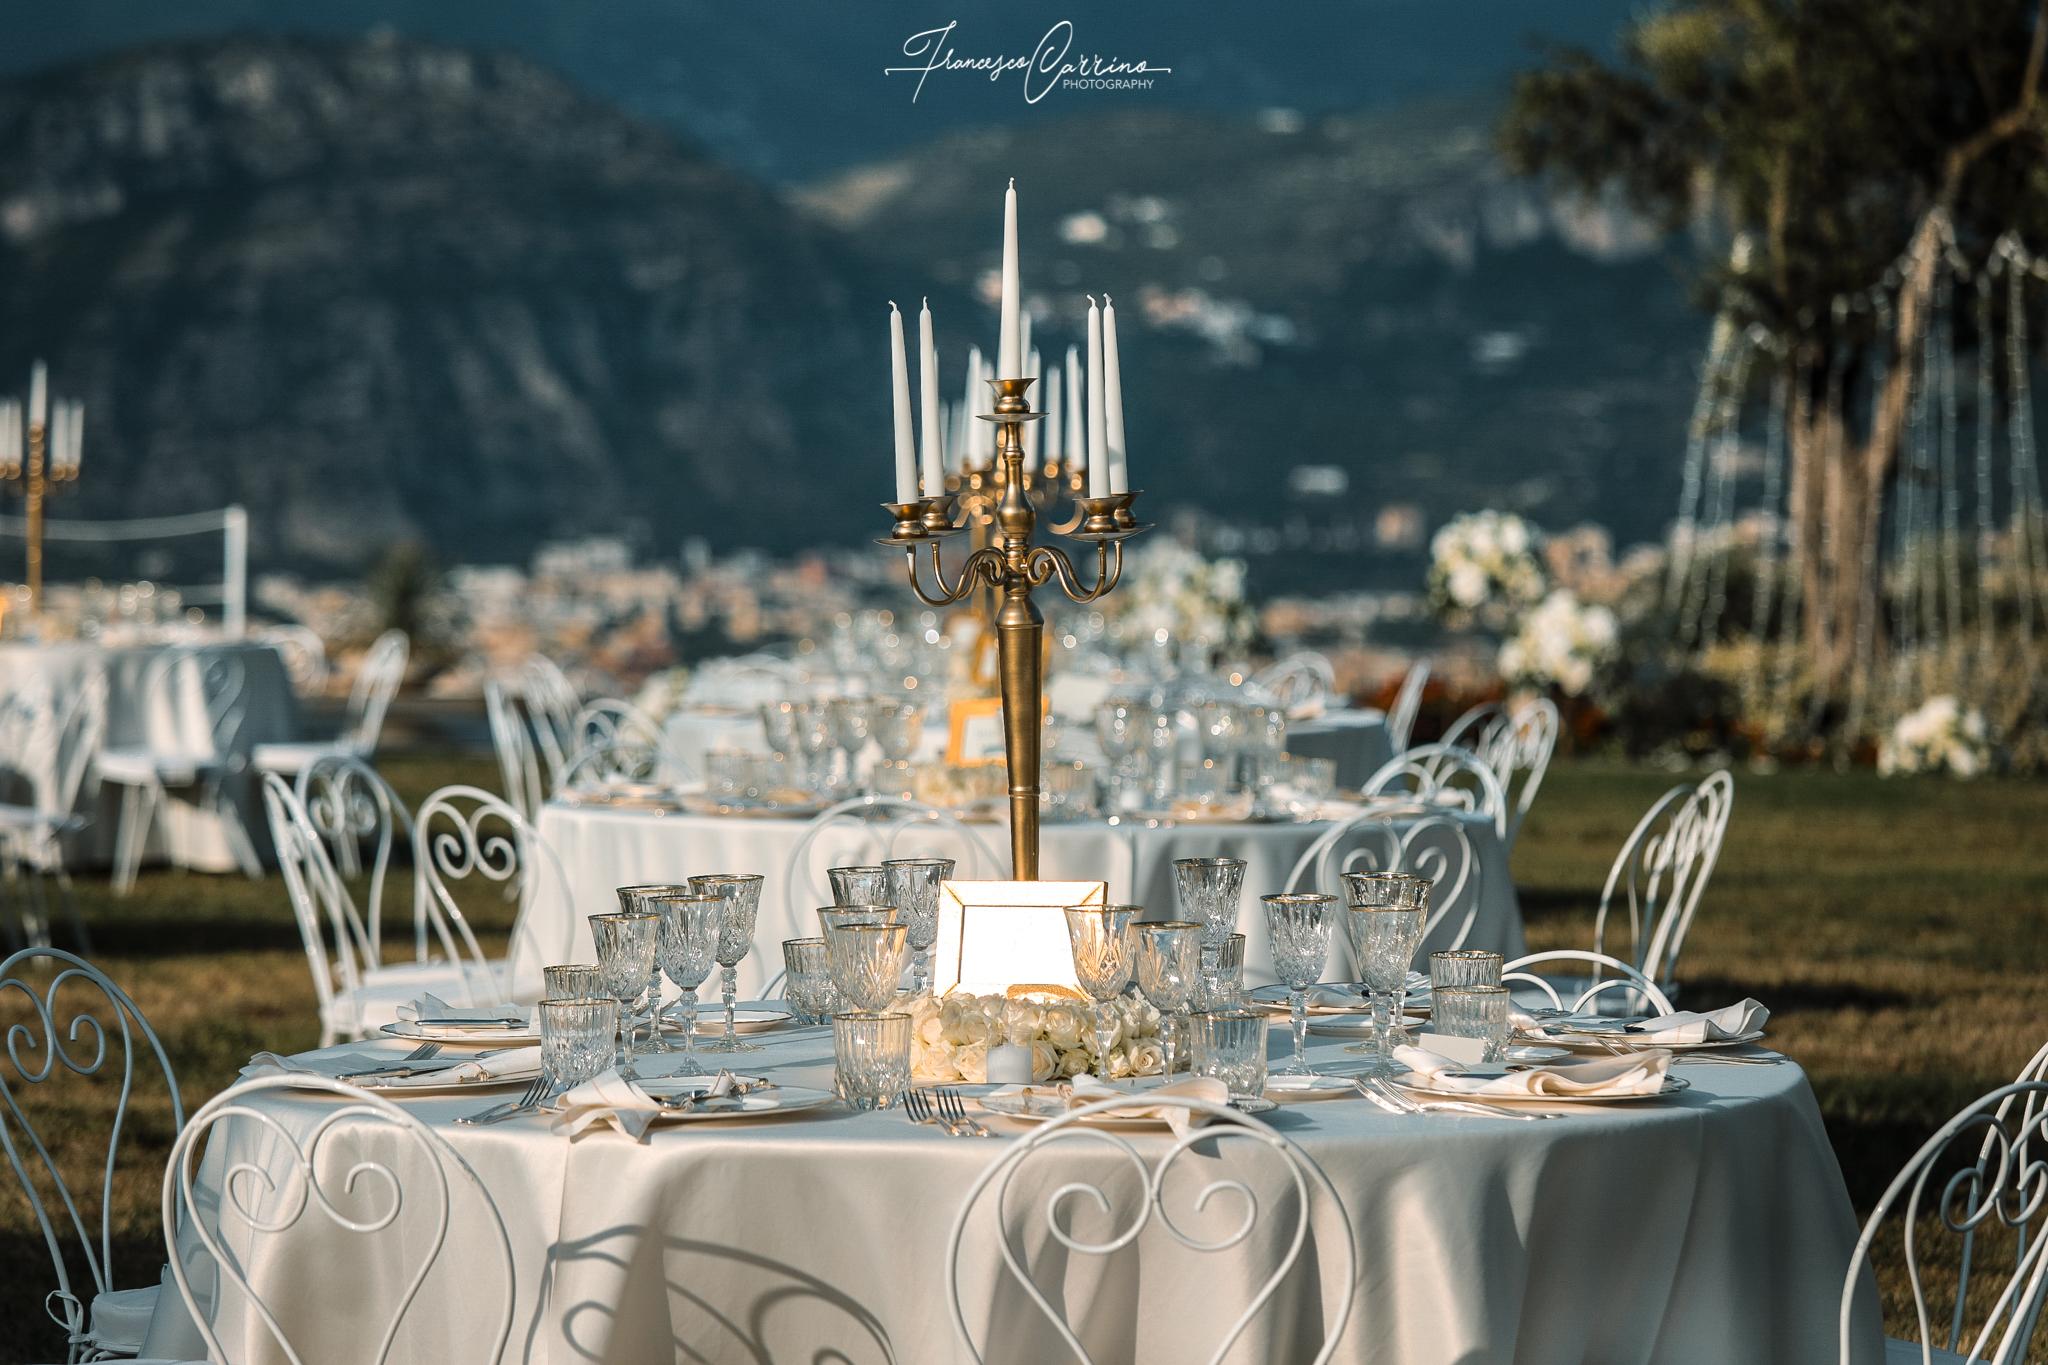 http://www.weddingamalfi.com/wp-content/uploads/Giannenza-13-luglio-2019-1.jpg